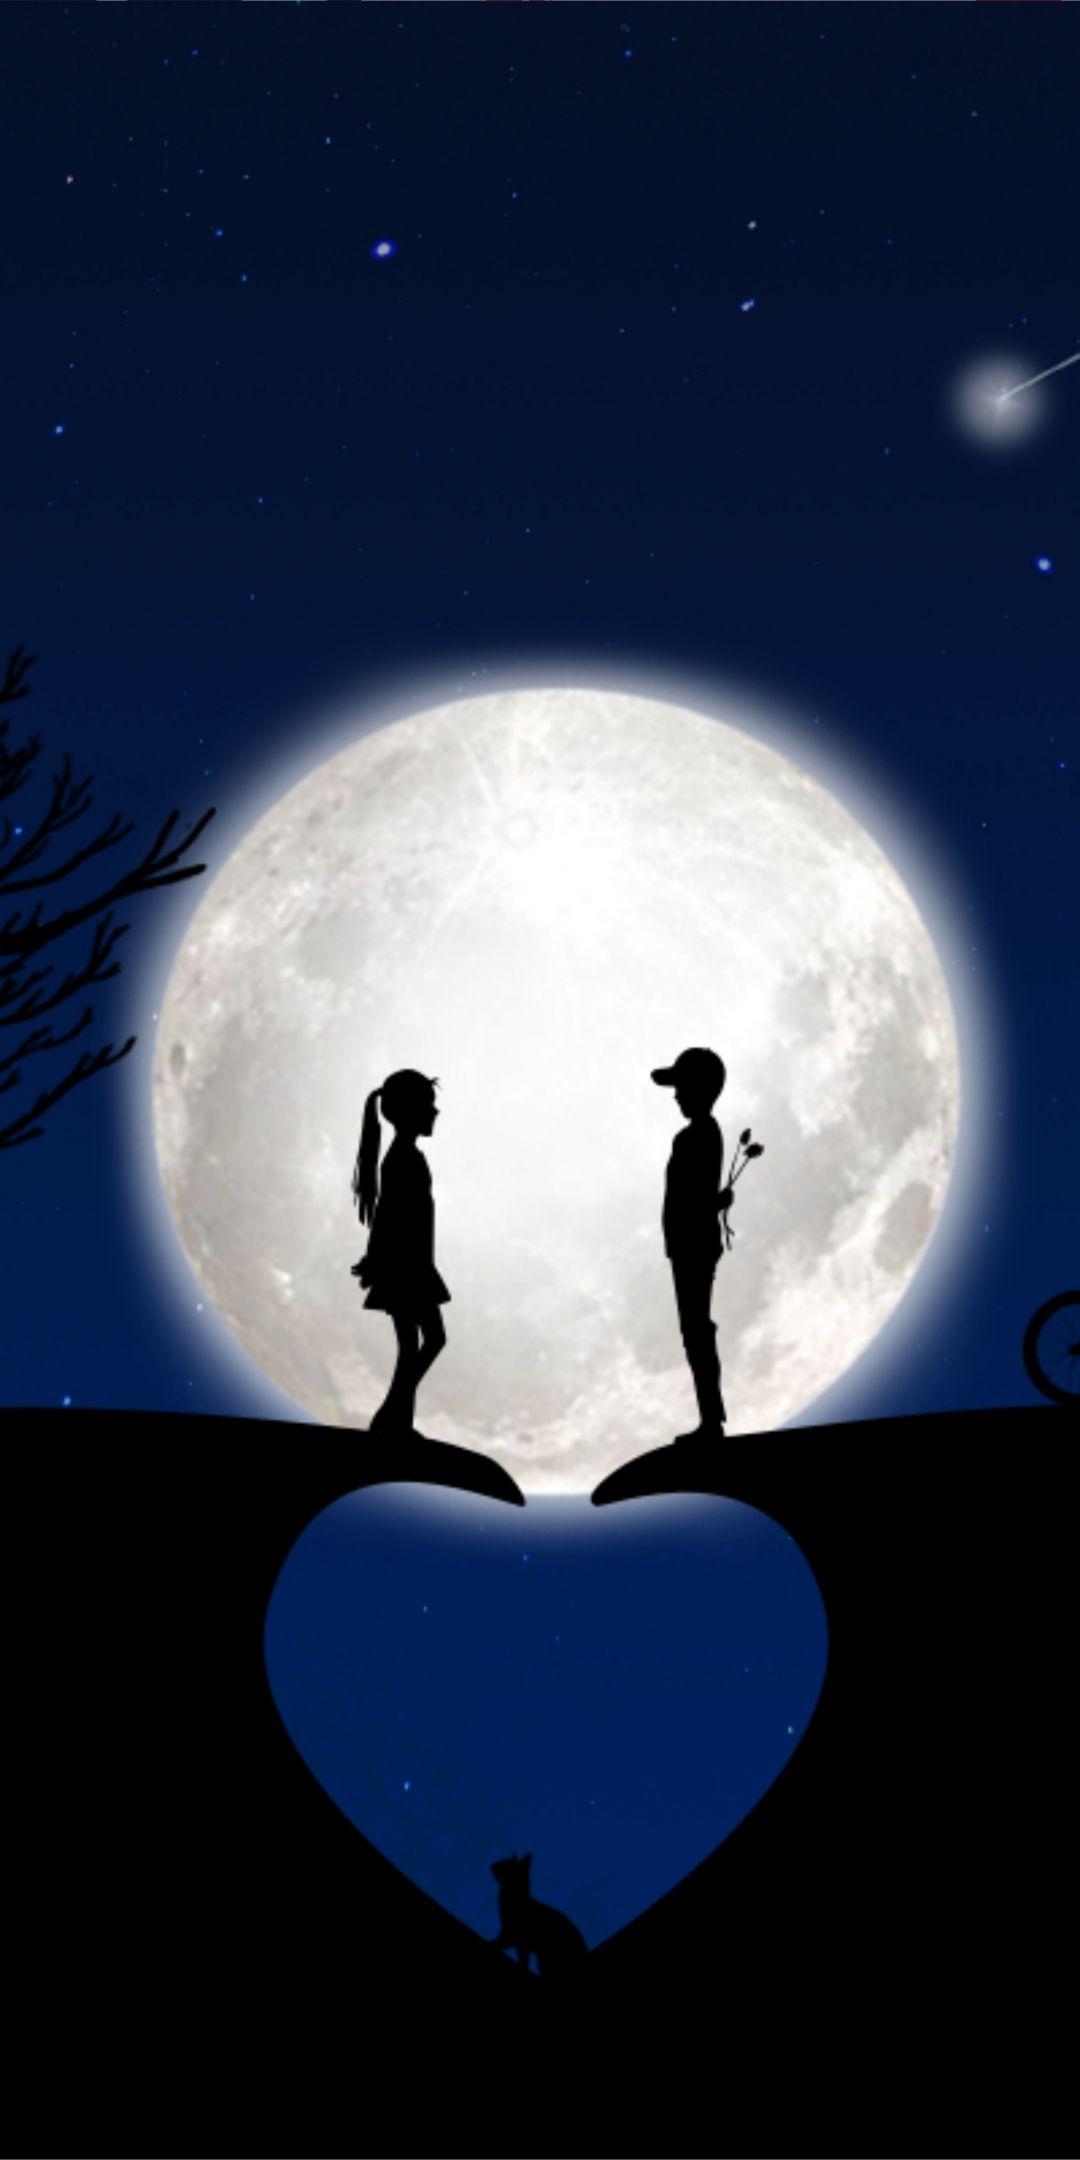 Heart, moon, couple, silhouette, art, 1080x2160 wallpaper